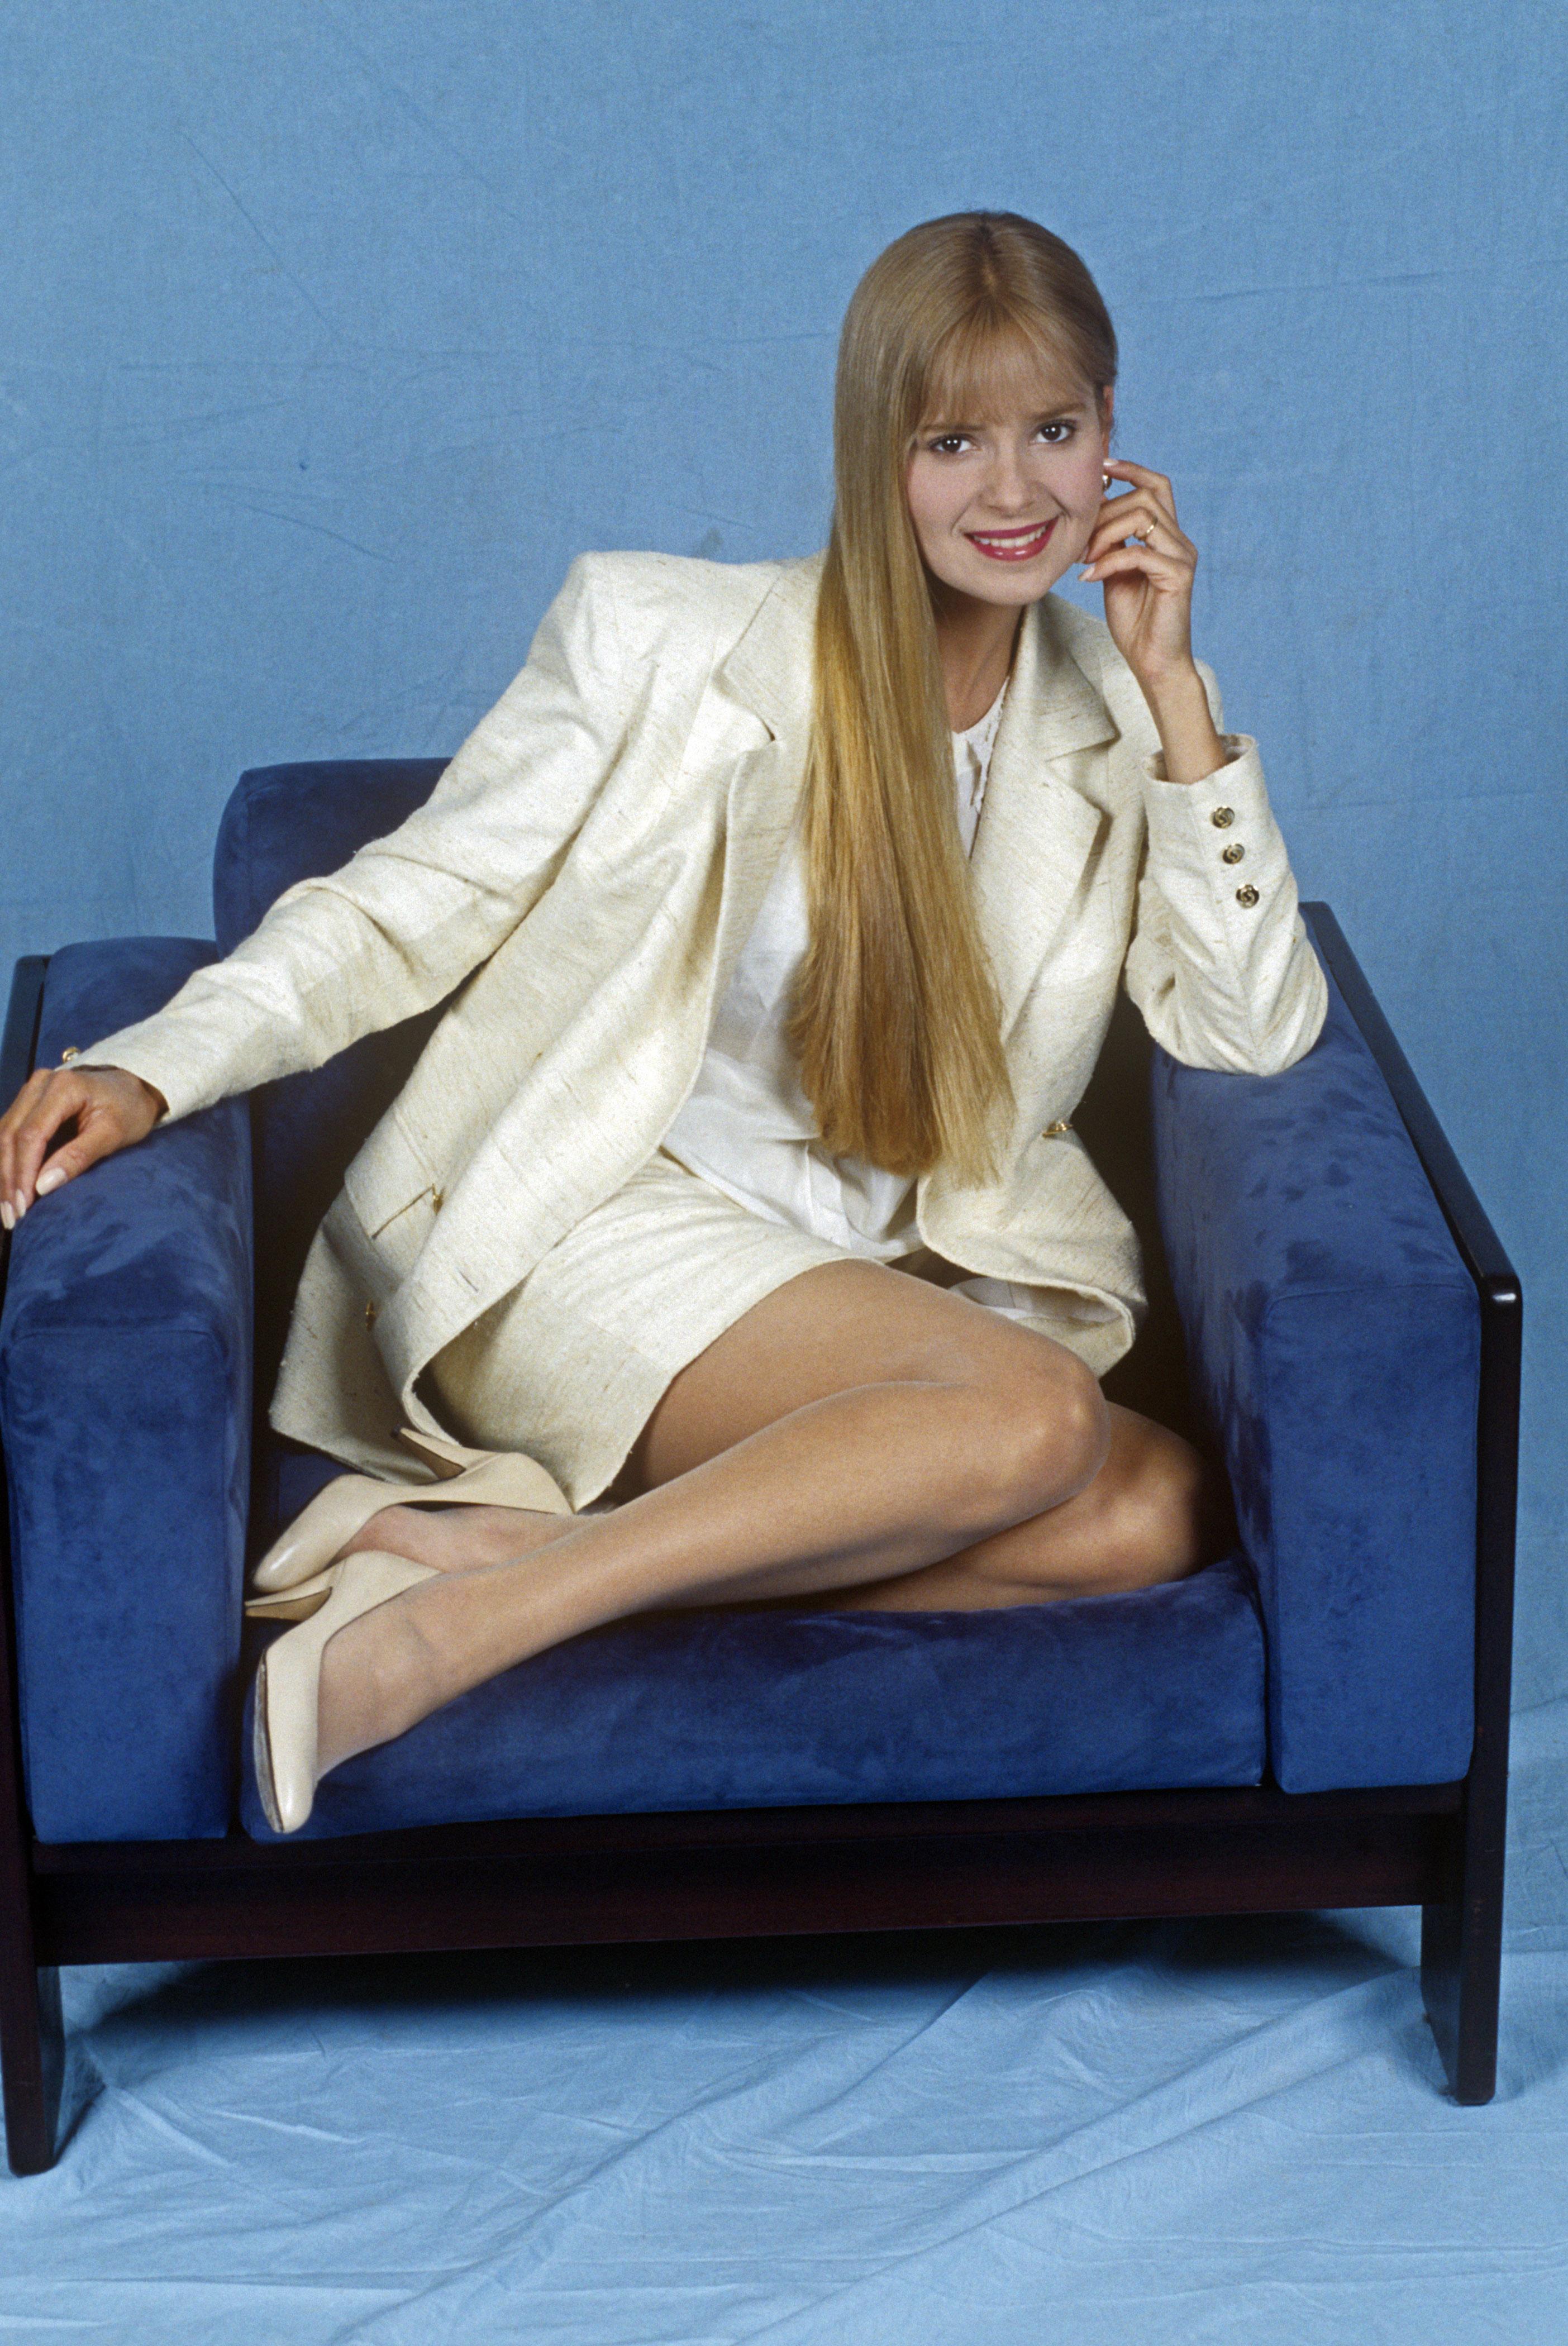 Grecia Colmenares sitting on an armchair